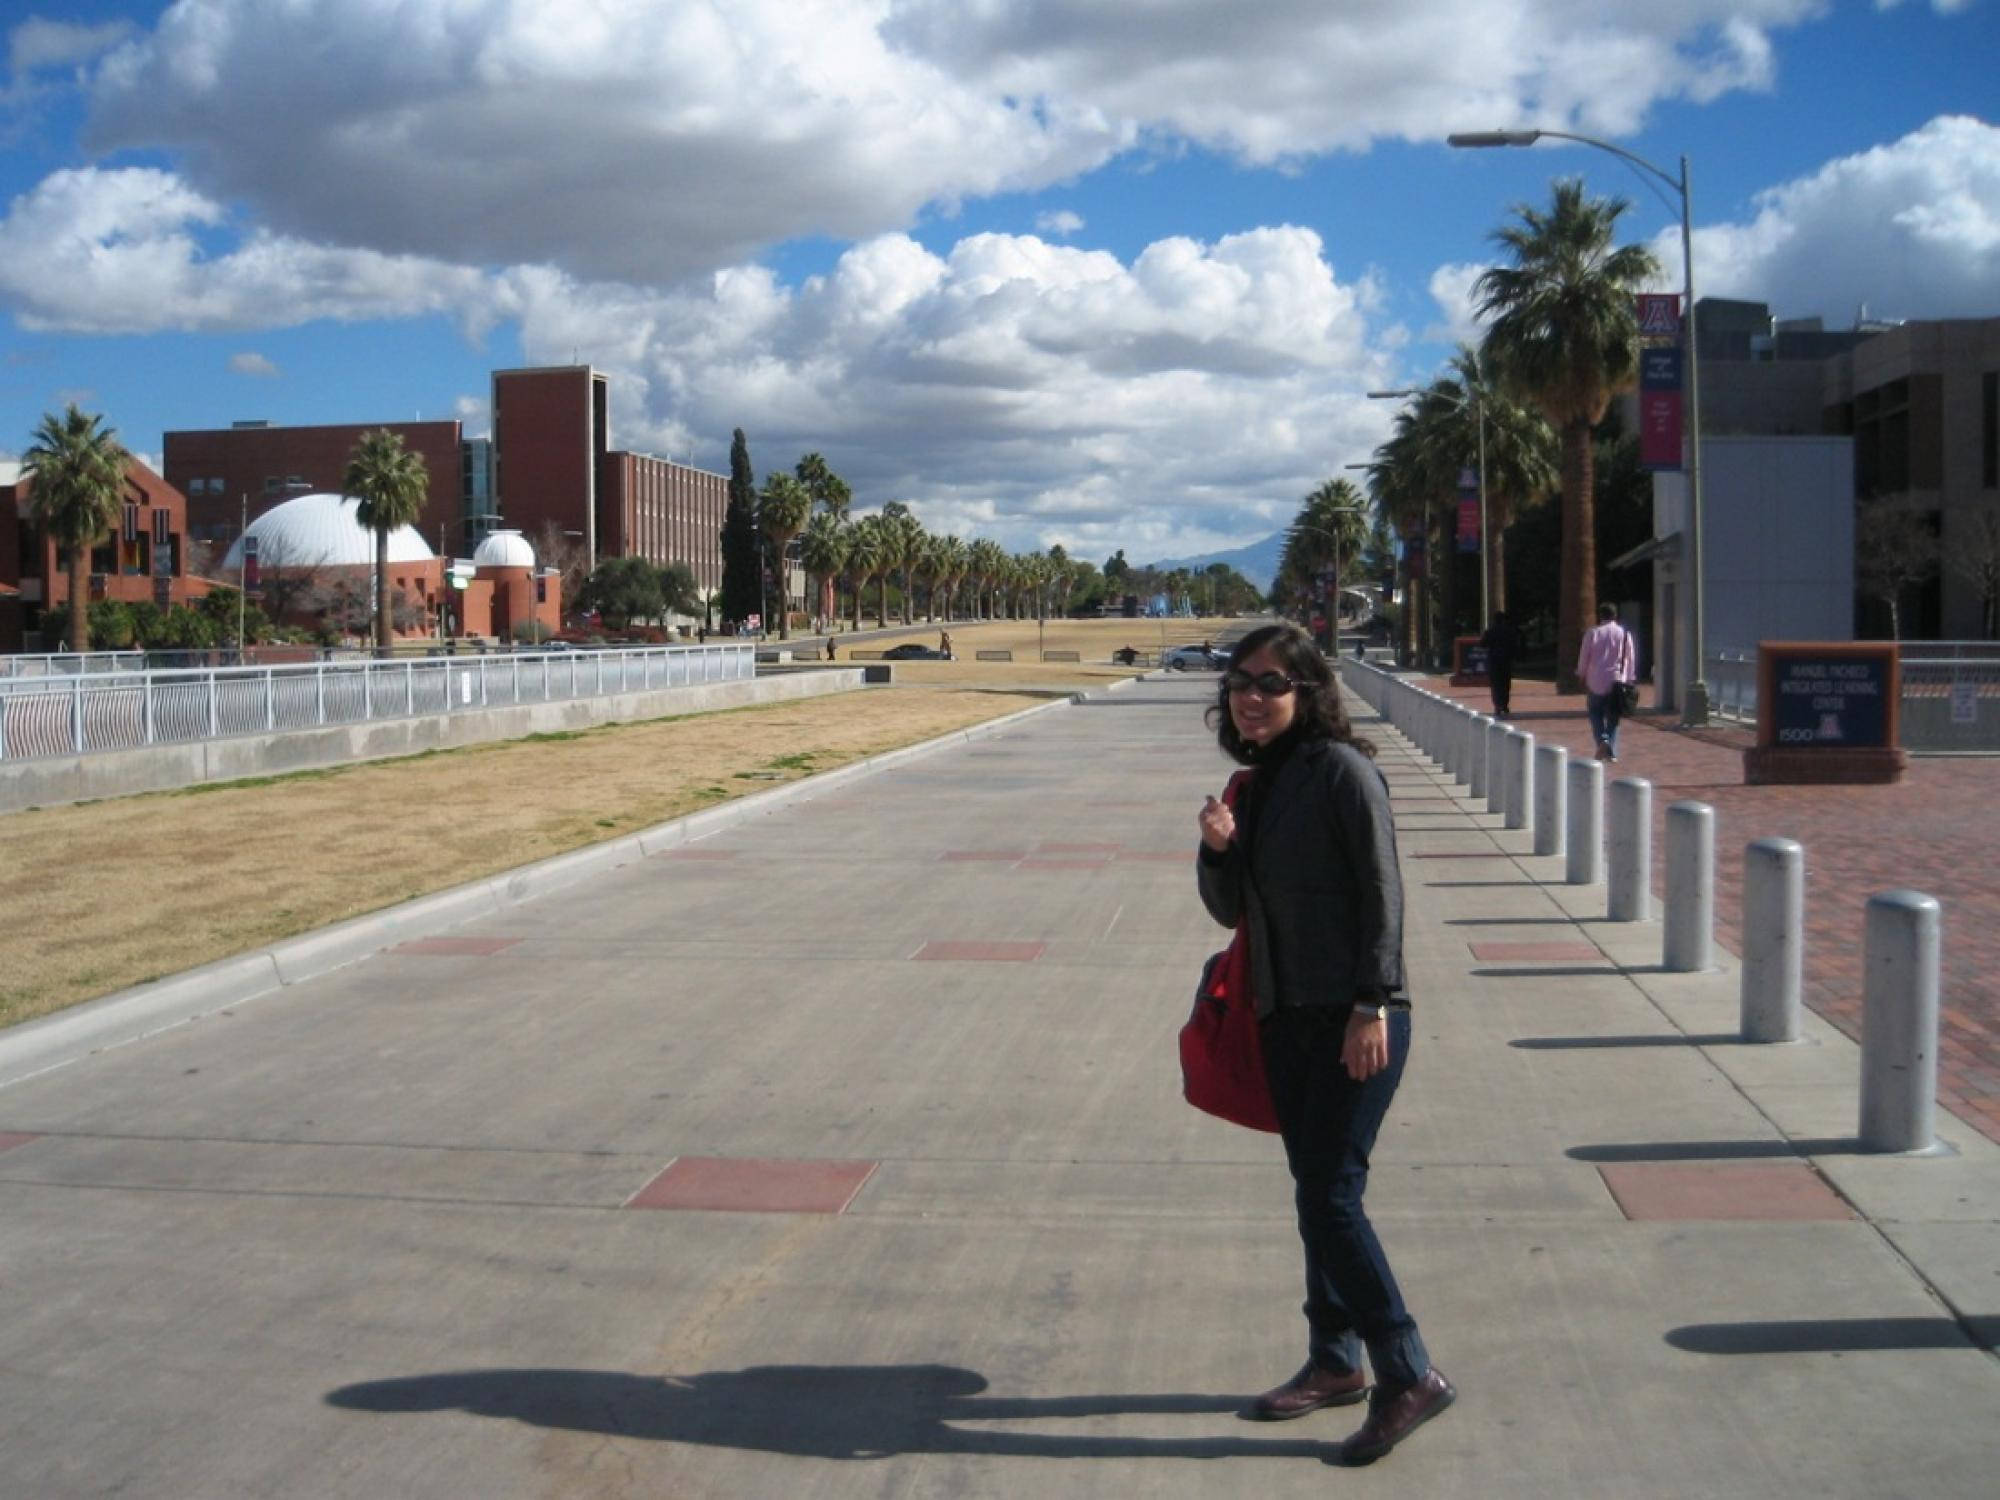 Renata Távara Rodrich, who was born and raised in Piura, Peru, participated in the Western Hemisphere Institute at the UA in 2008.